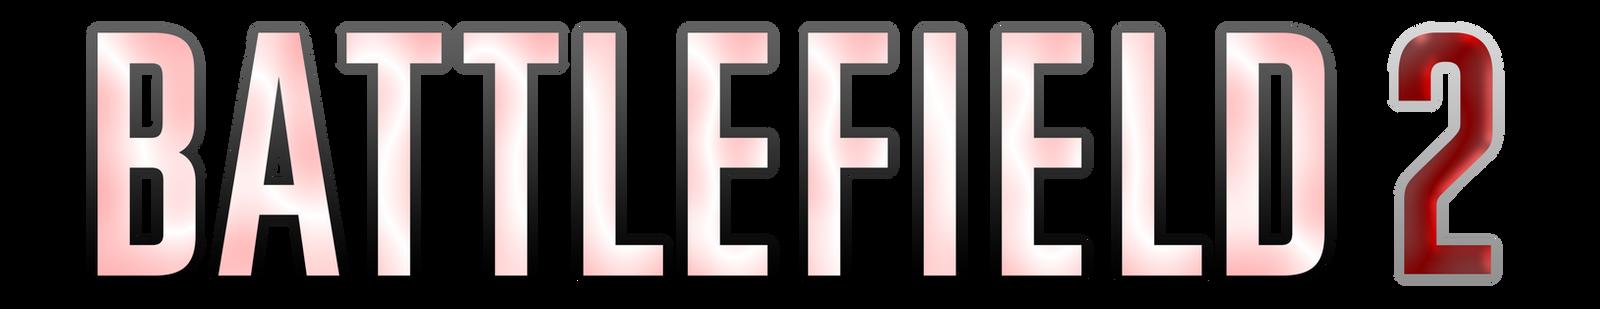 Battlefield 2 Newer Logo by WesleyVianen